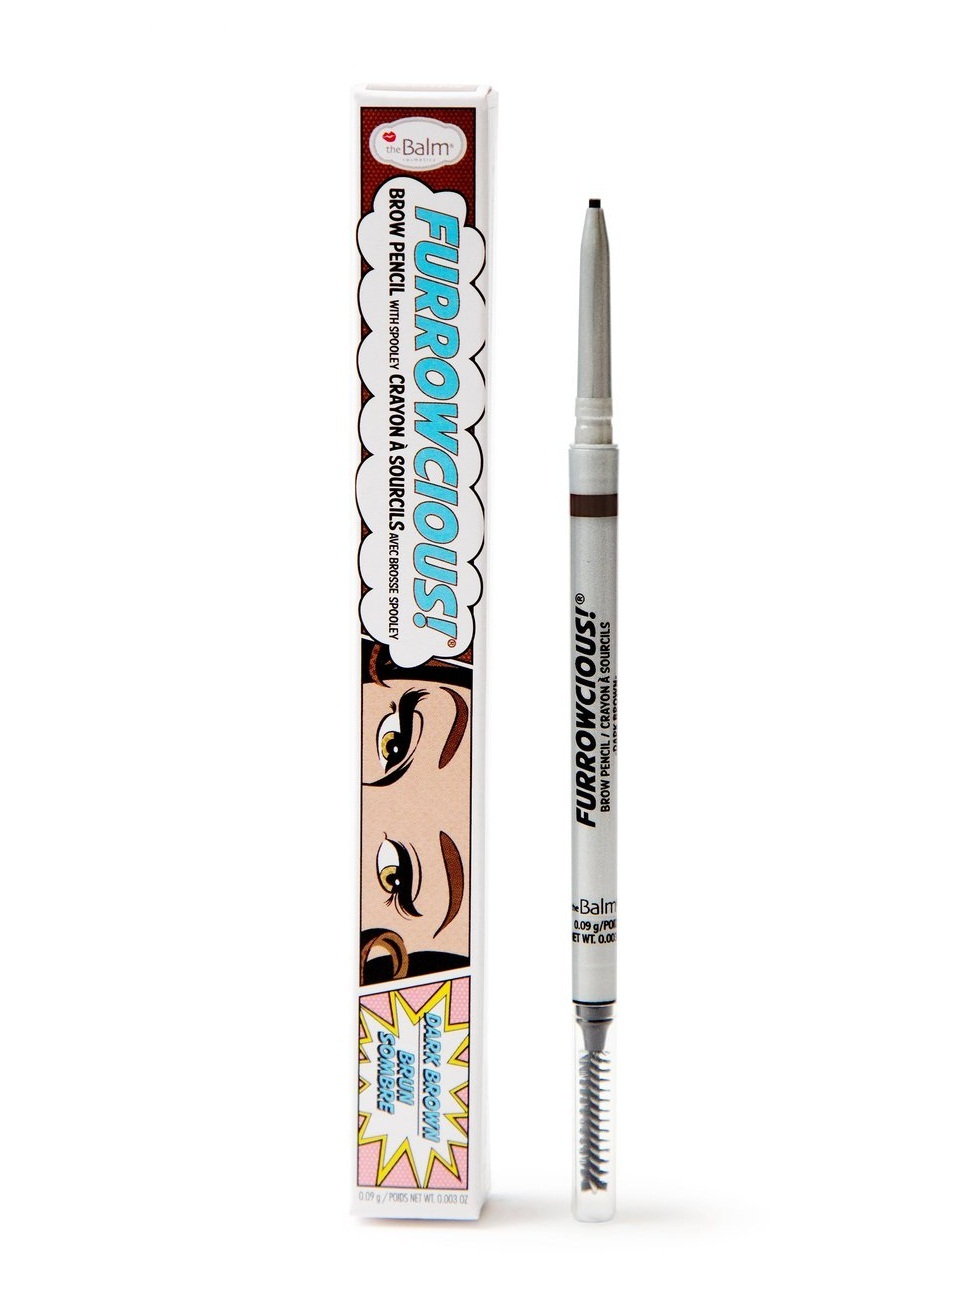 theBalm FURROWCIOUS!® Brow Pencil with Spooley - dark brown.jpg